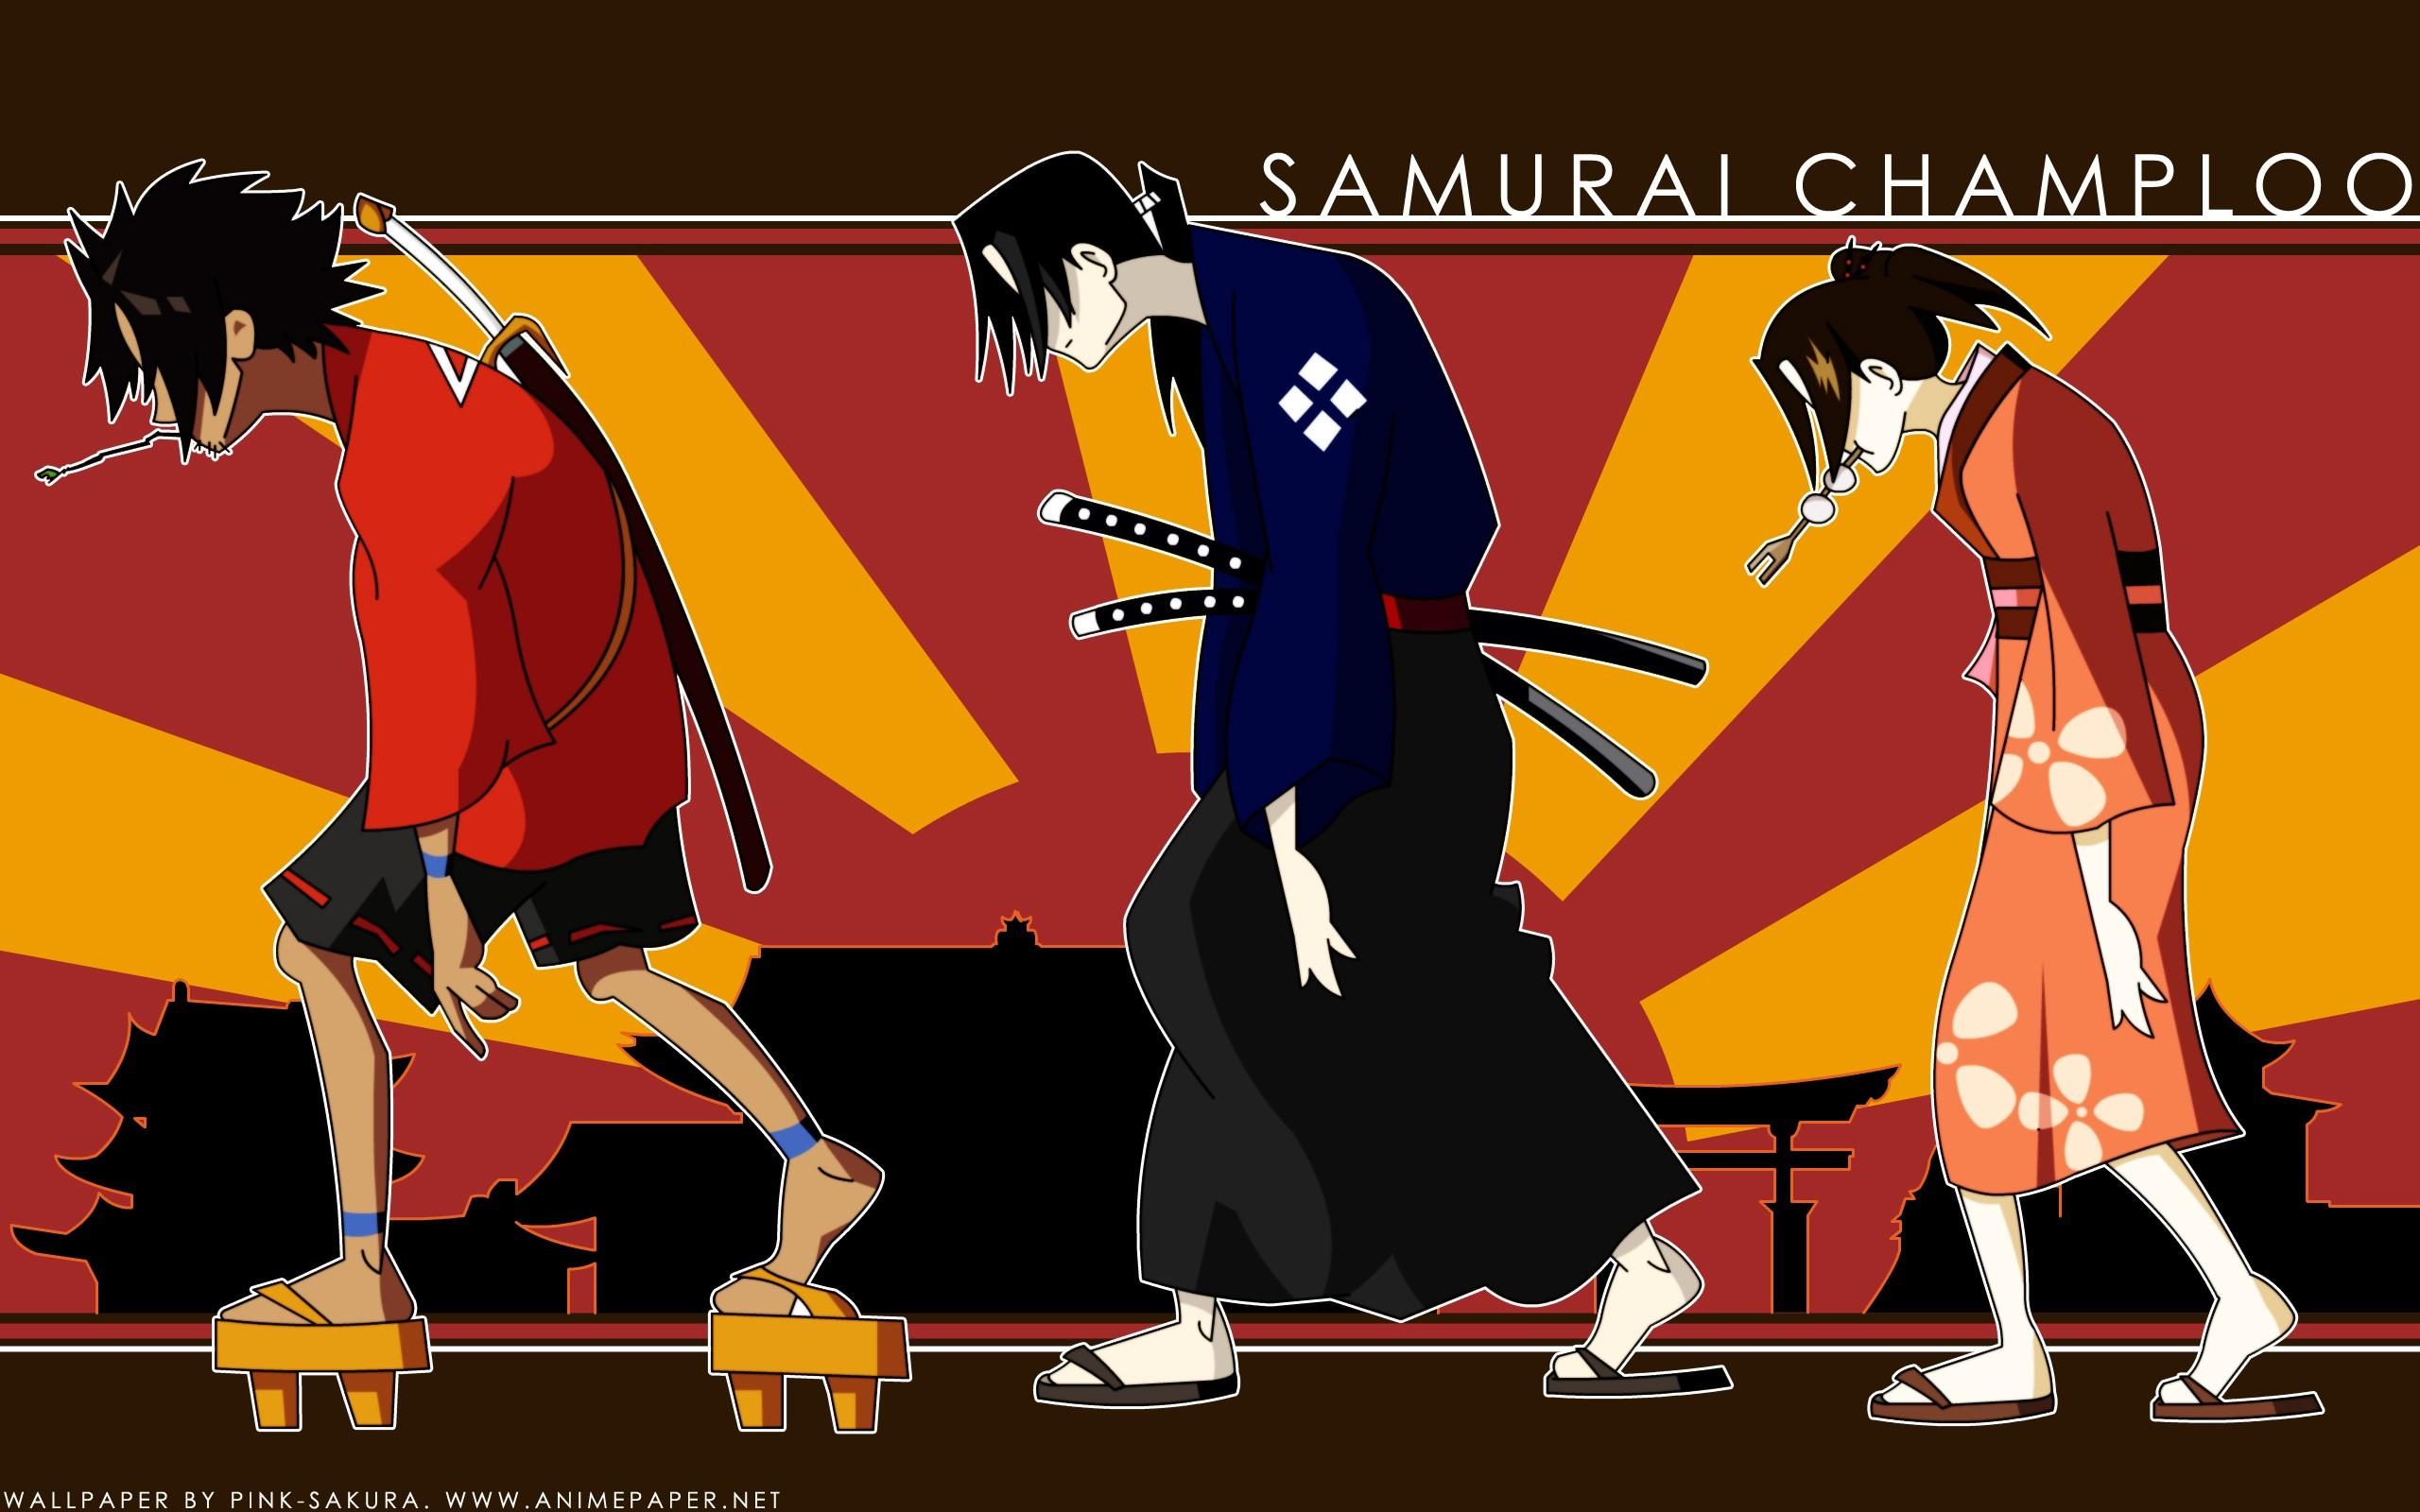 #1856610, samurai champloo category – hd wallpaper samurai champloo